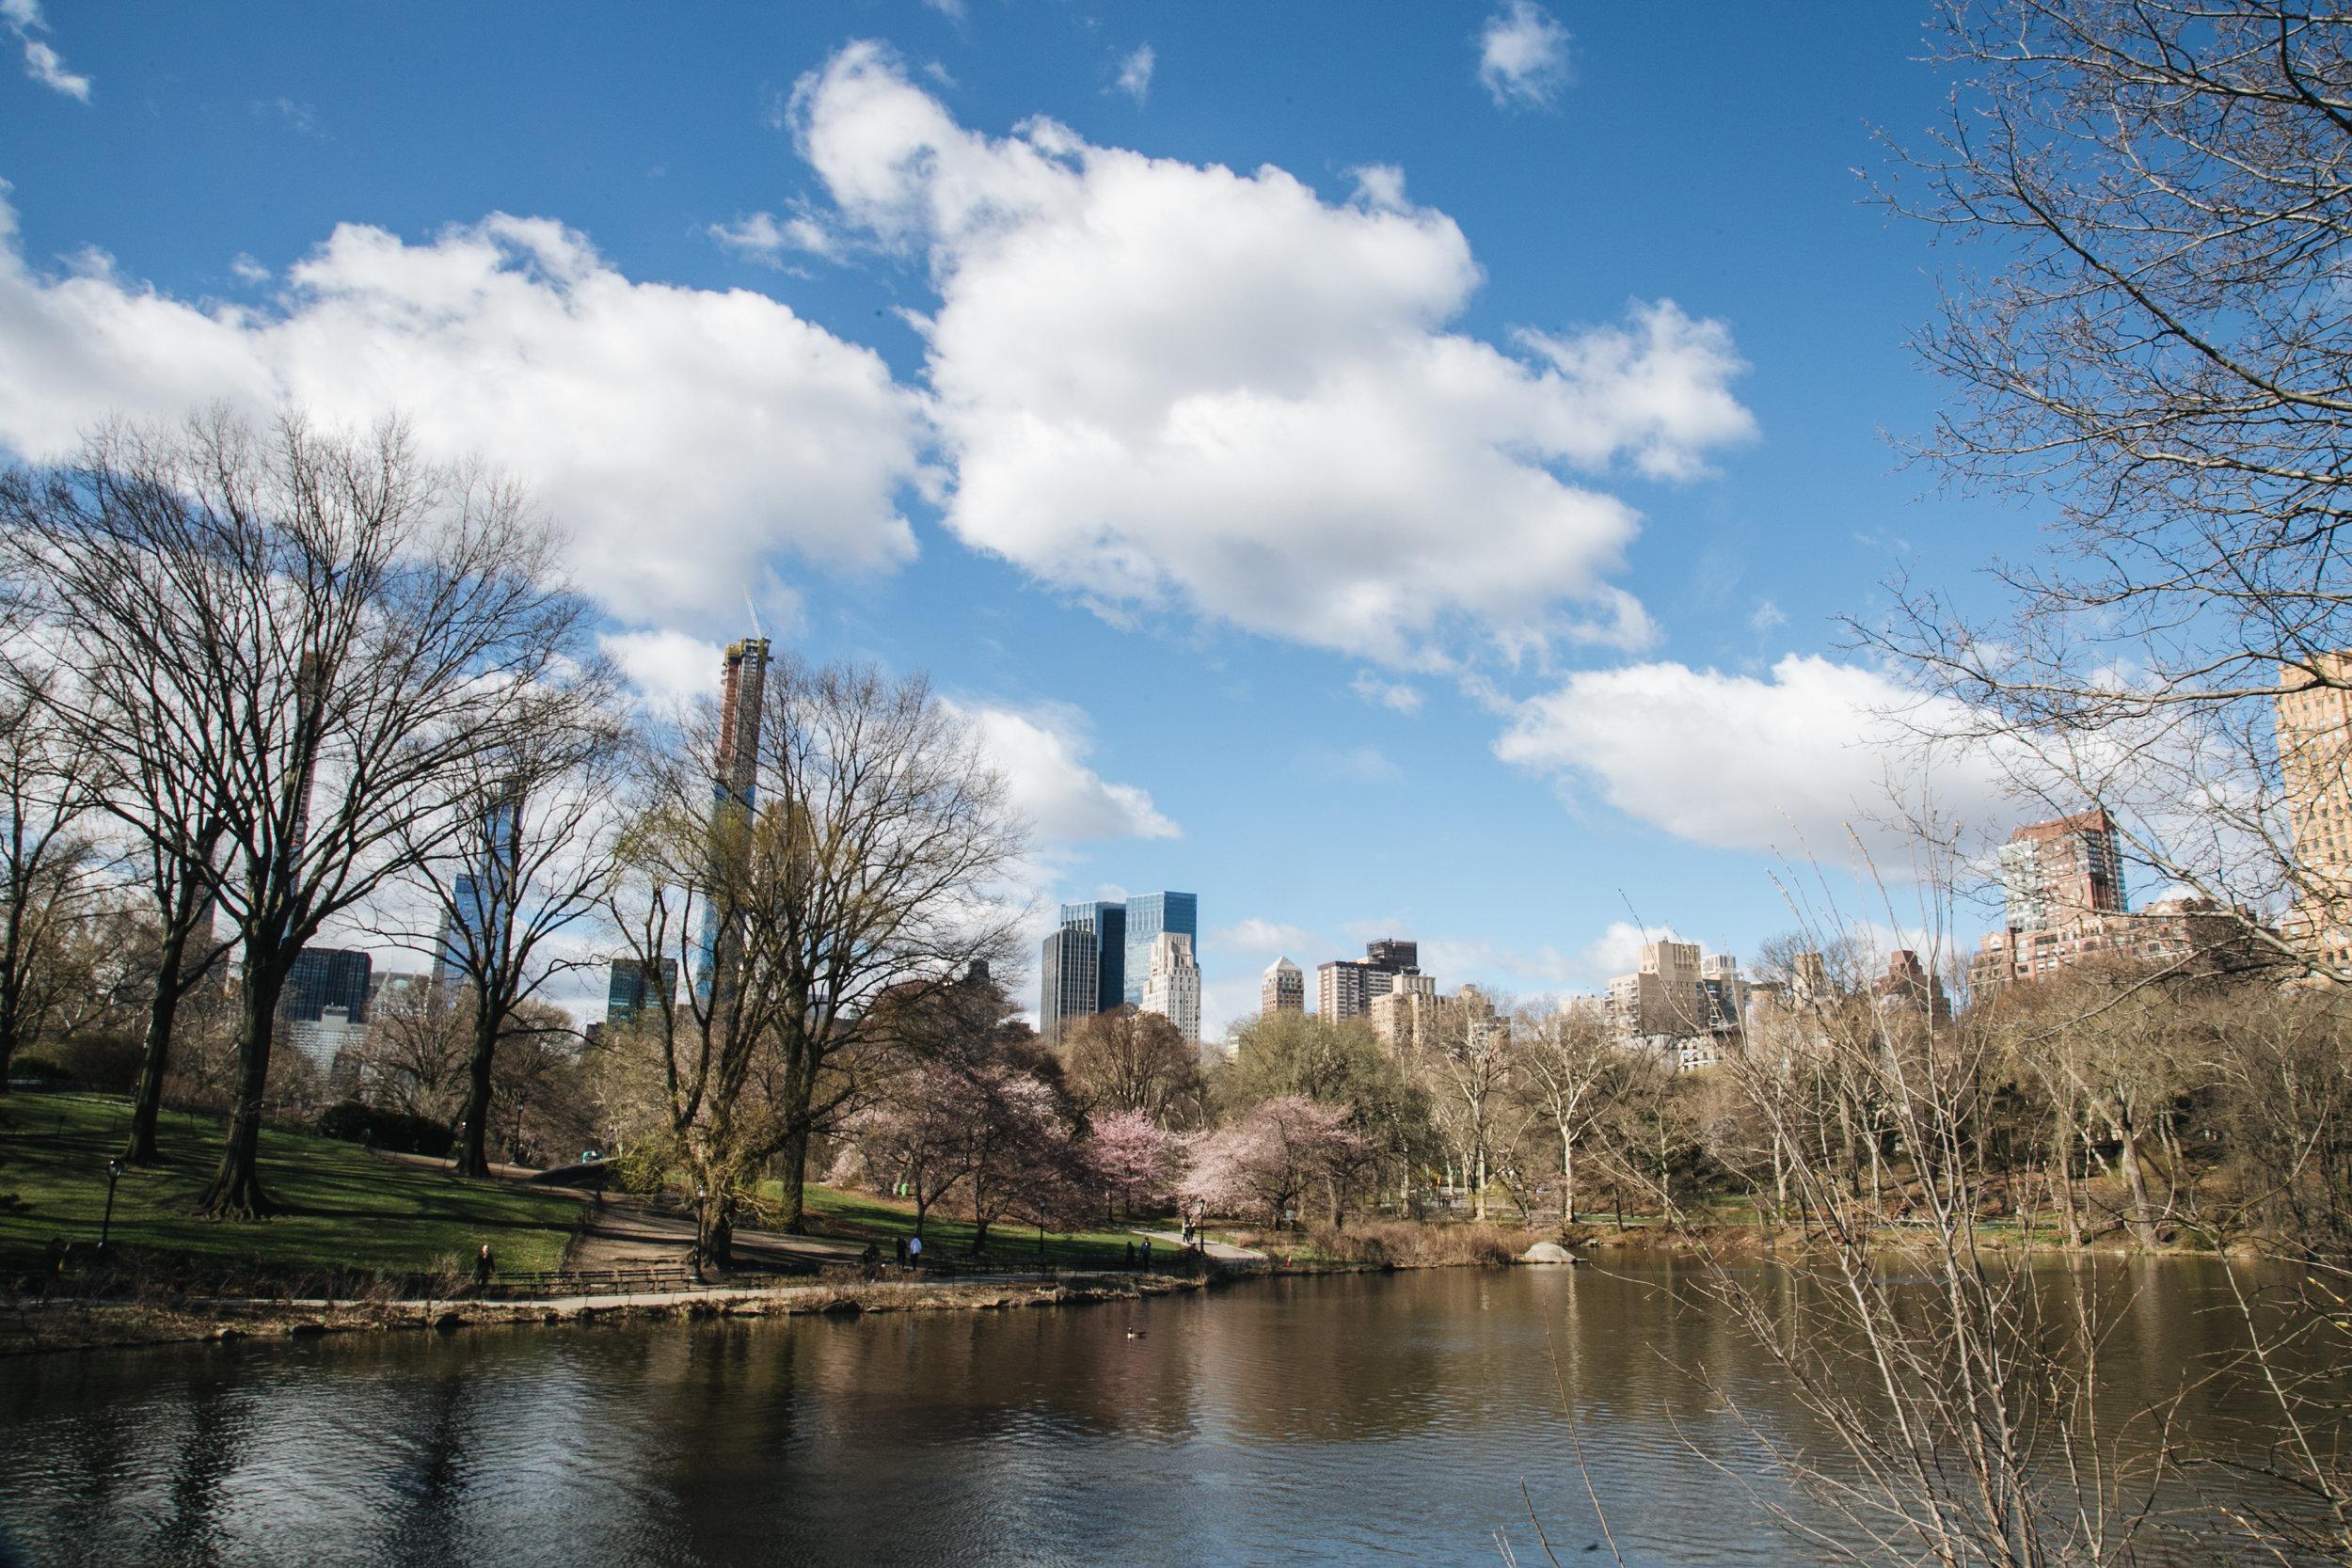 centralpark-NY-printemps-2019.jpg